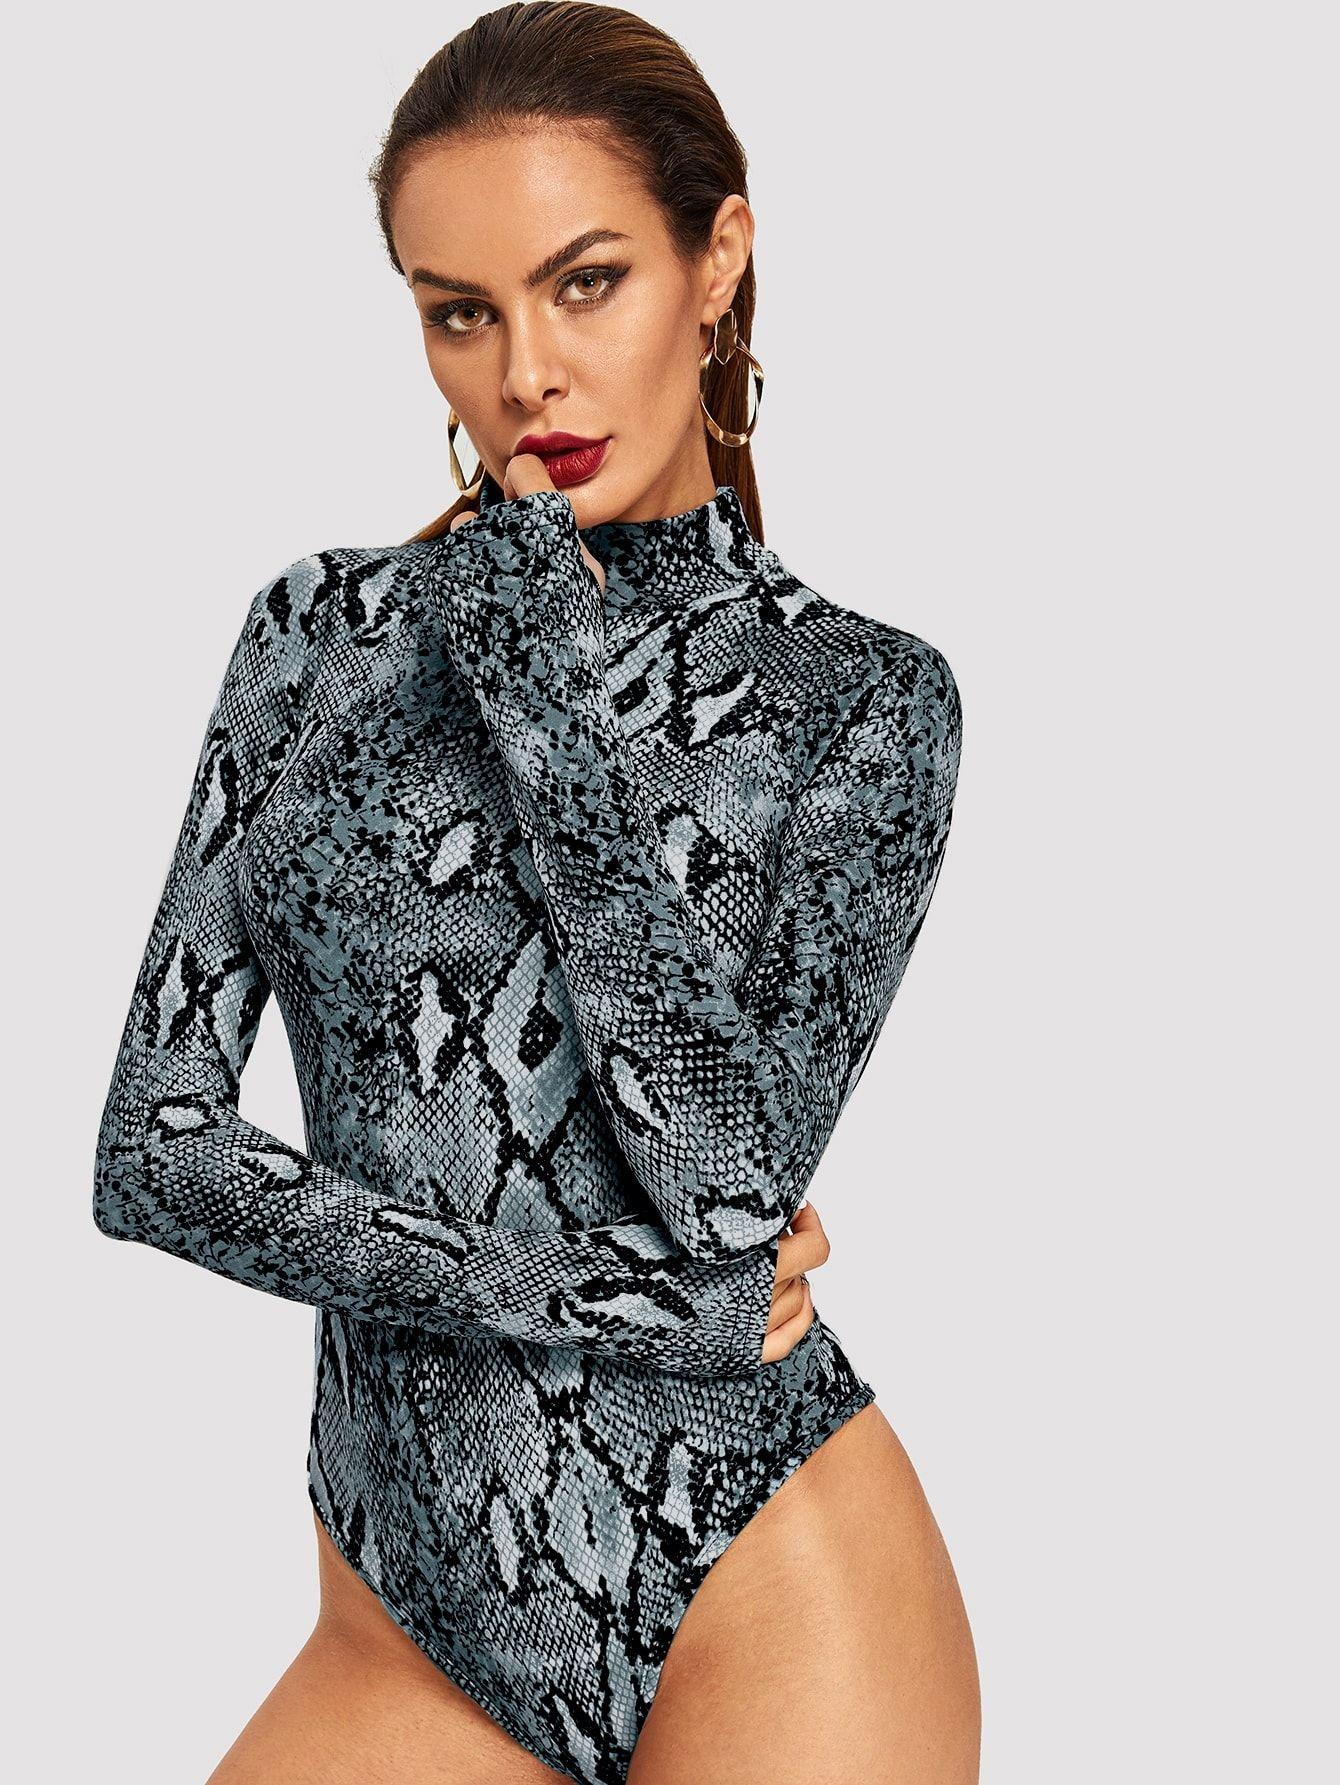 Womens Snake Leopard Print Body con Bodysuit Long Sleeve High Neck Leotard dress